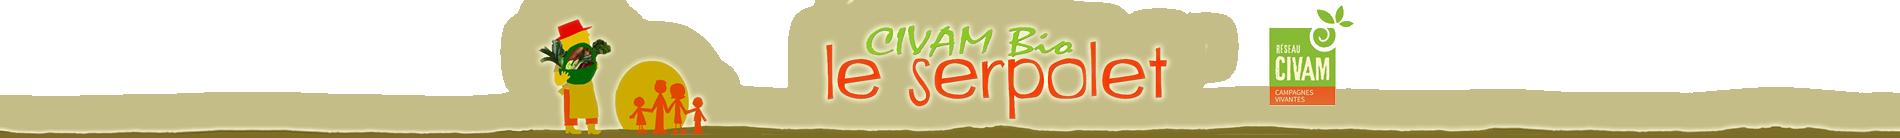 Le serpolet - CIVAM Bio